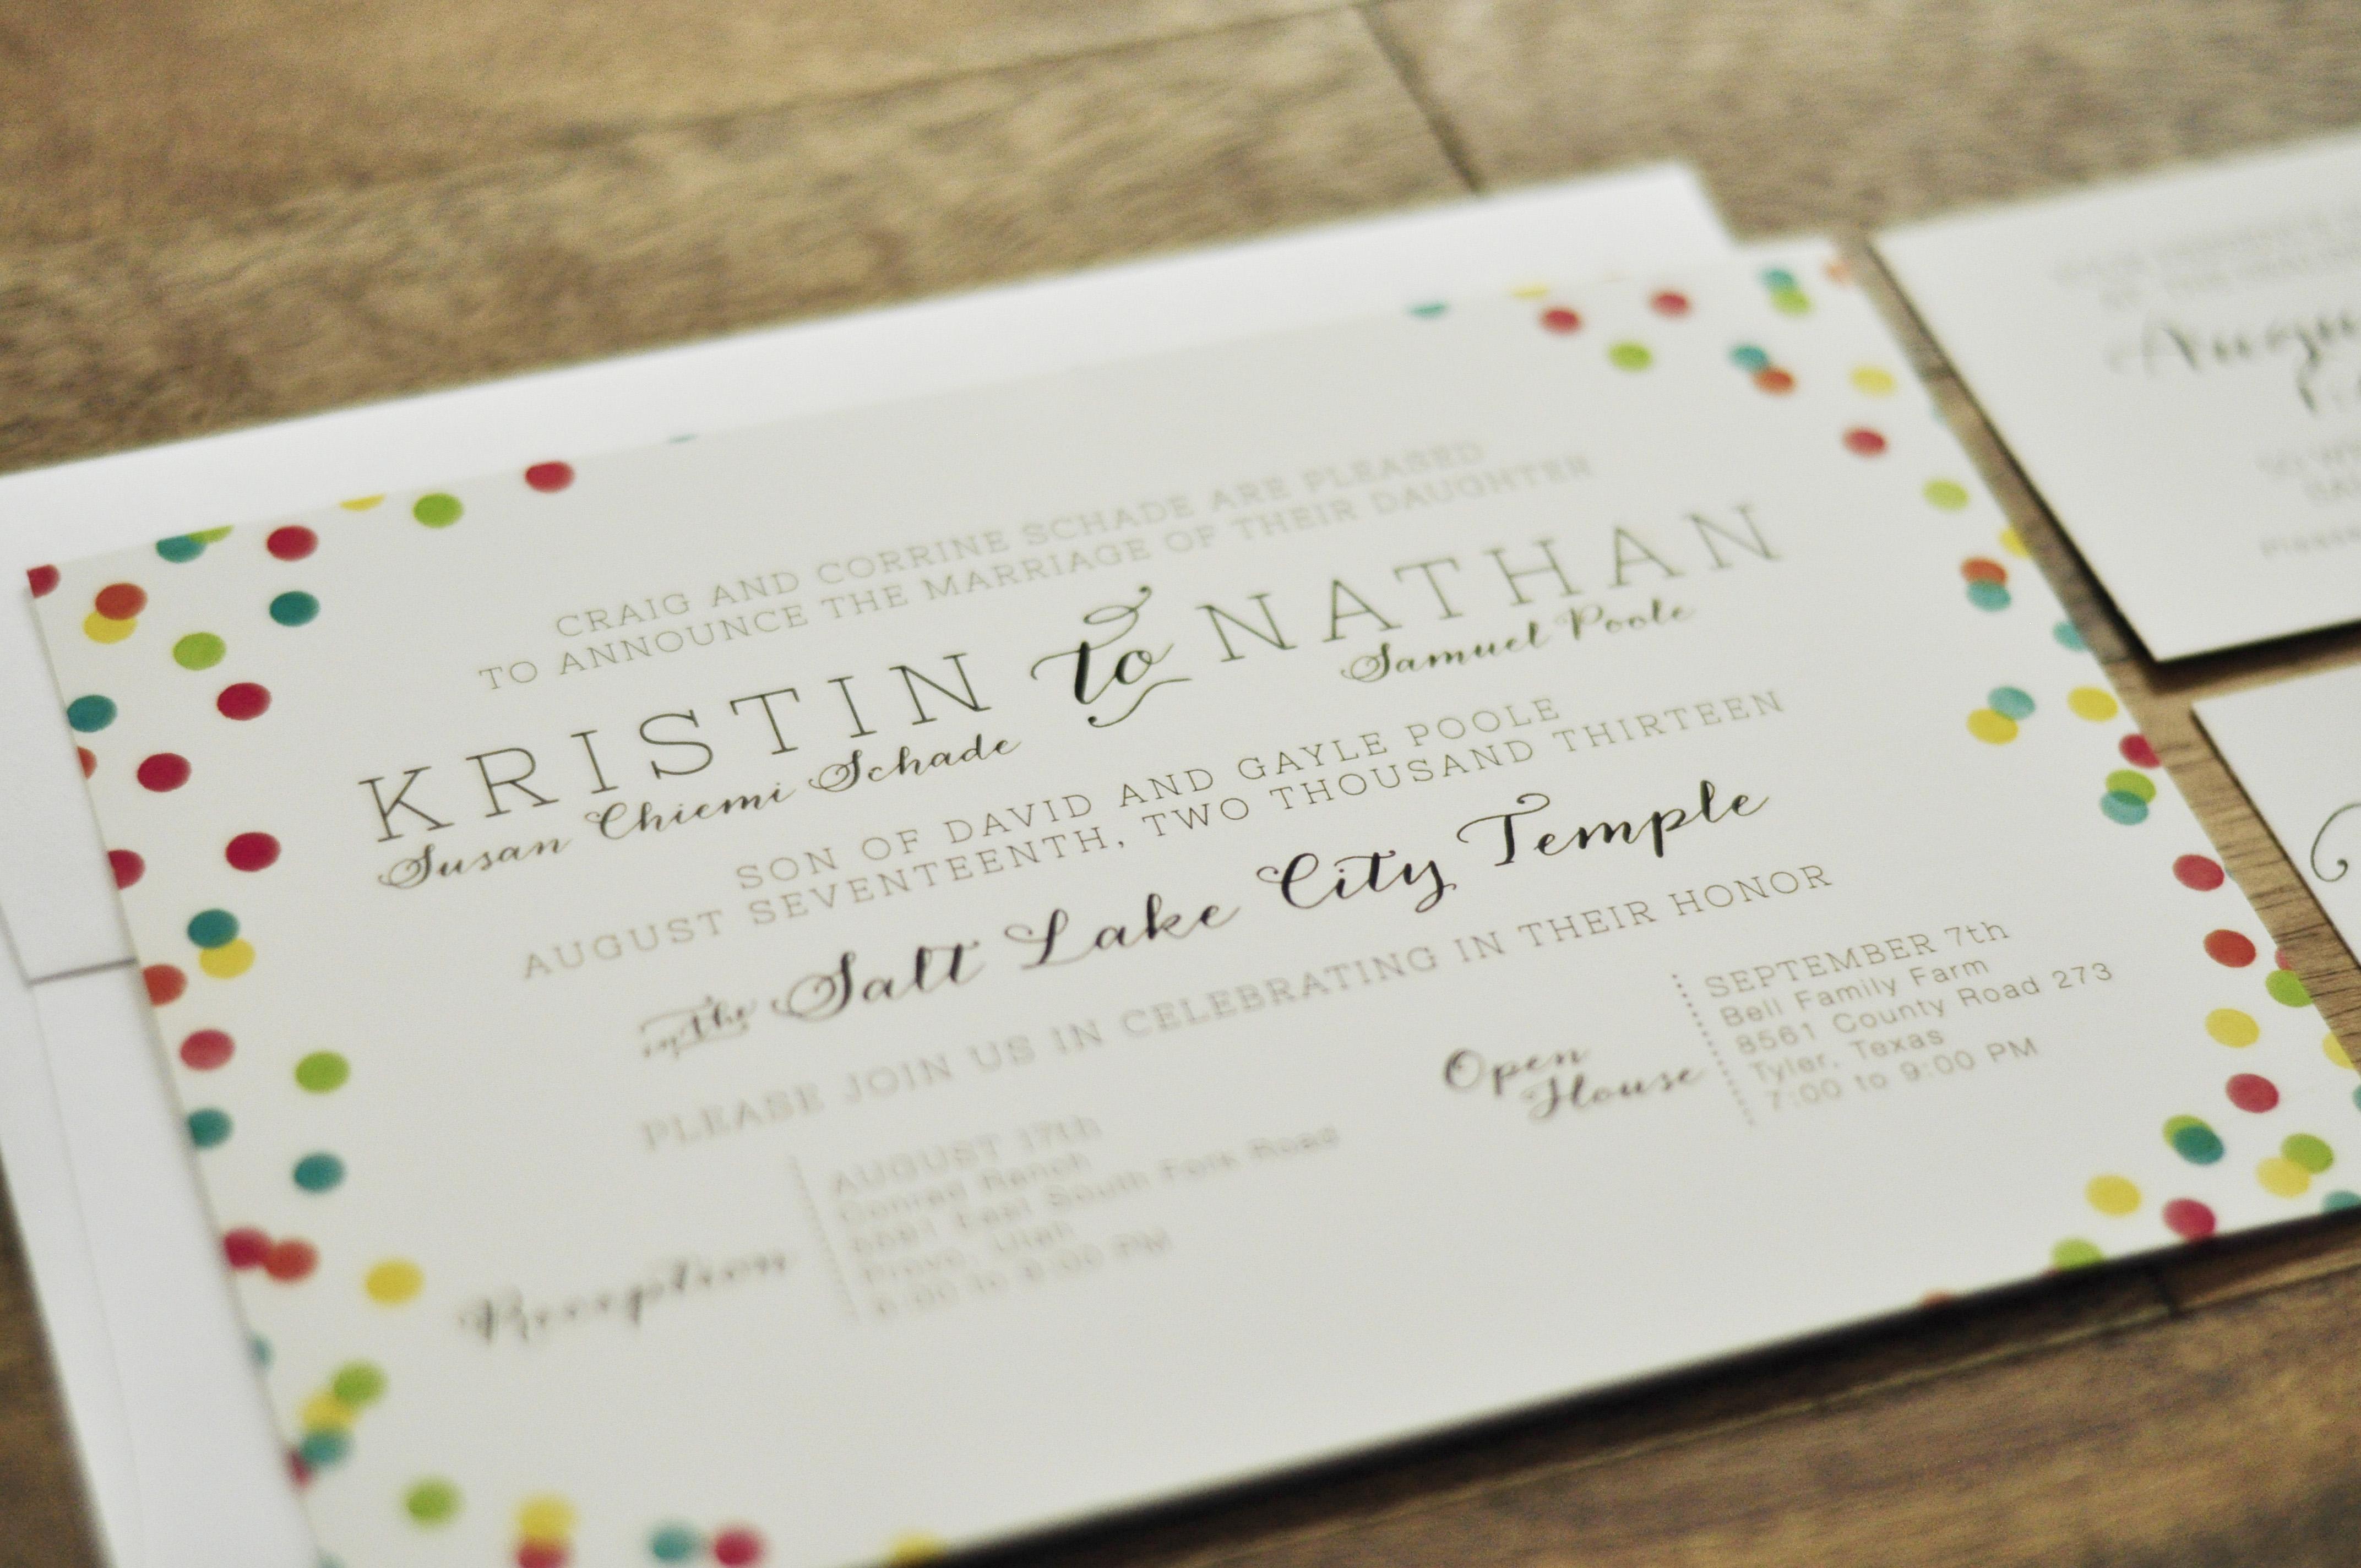 Confetti wedding invitation right west confettiweddinginvitationcloseup monicamarmolfo Images